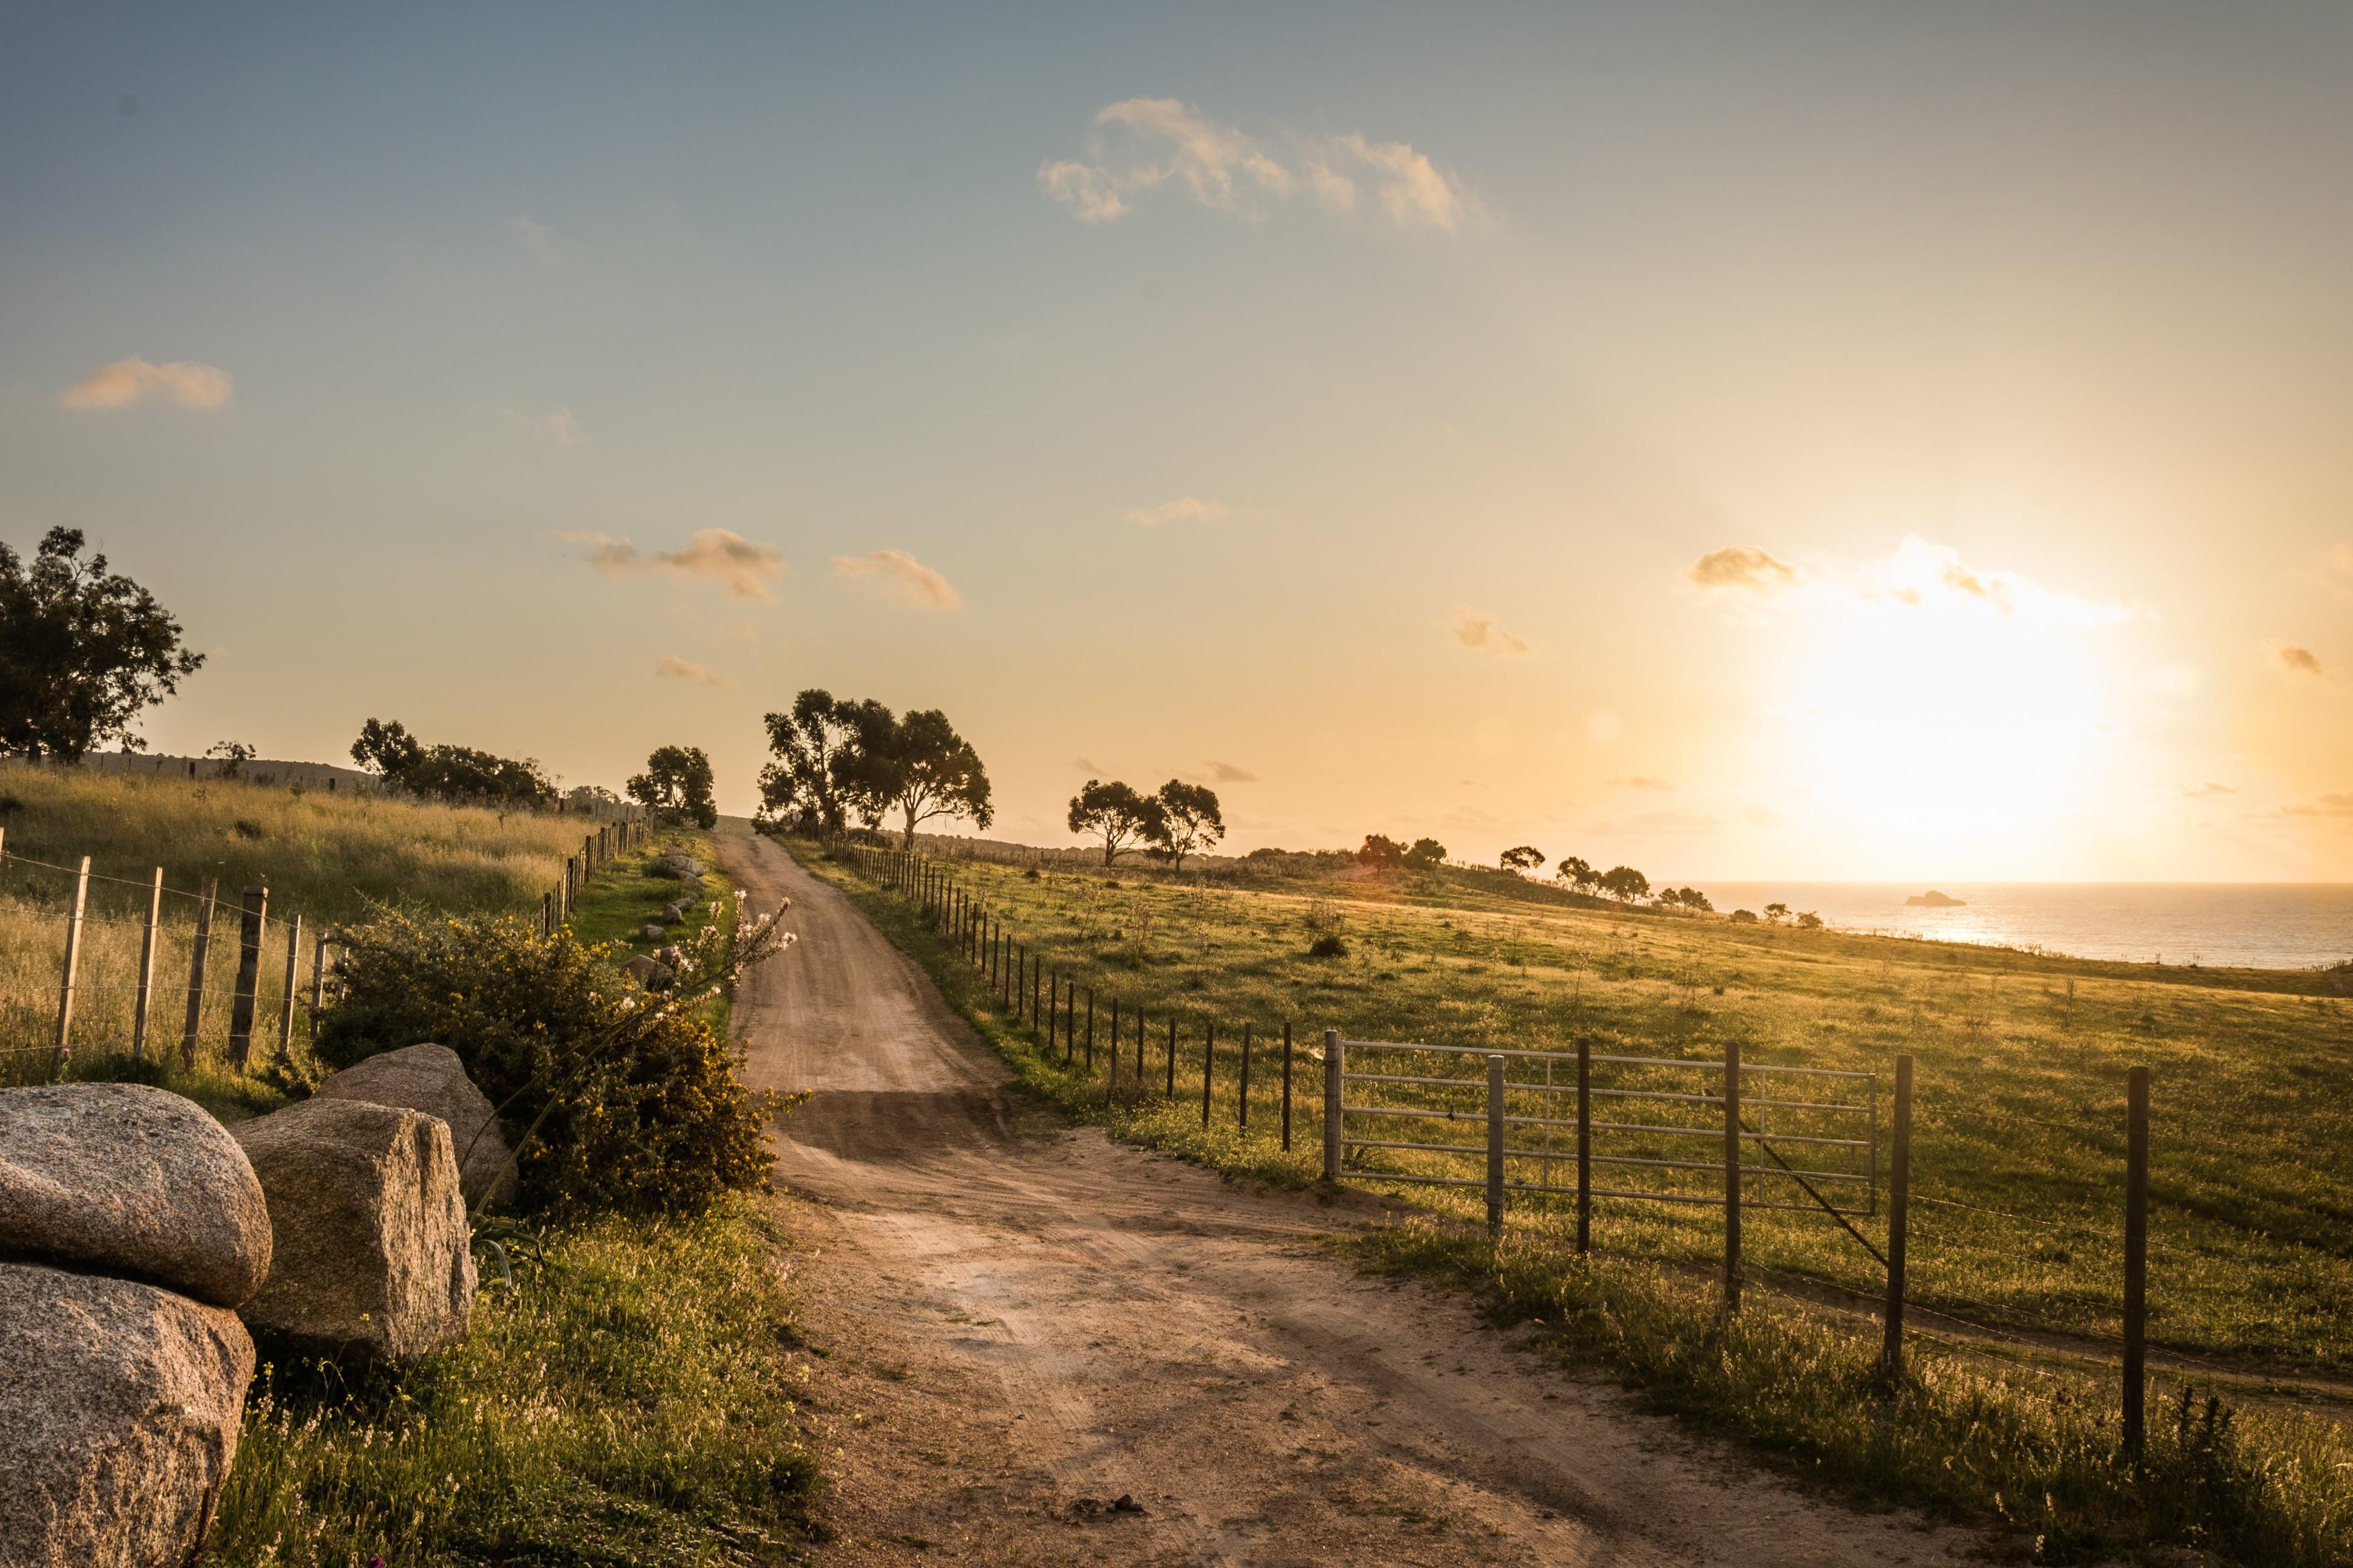 Дорога поле забор солнце бесплатно